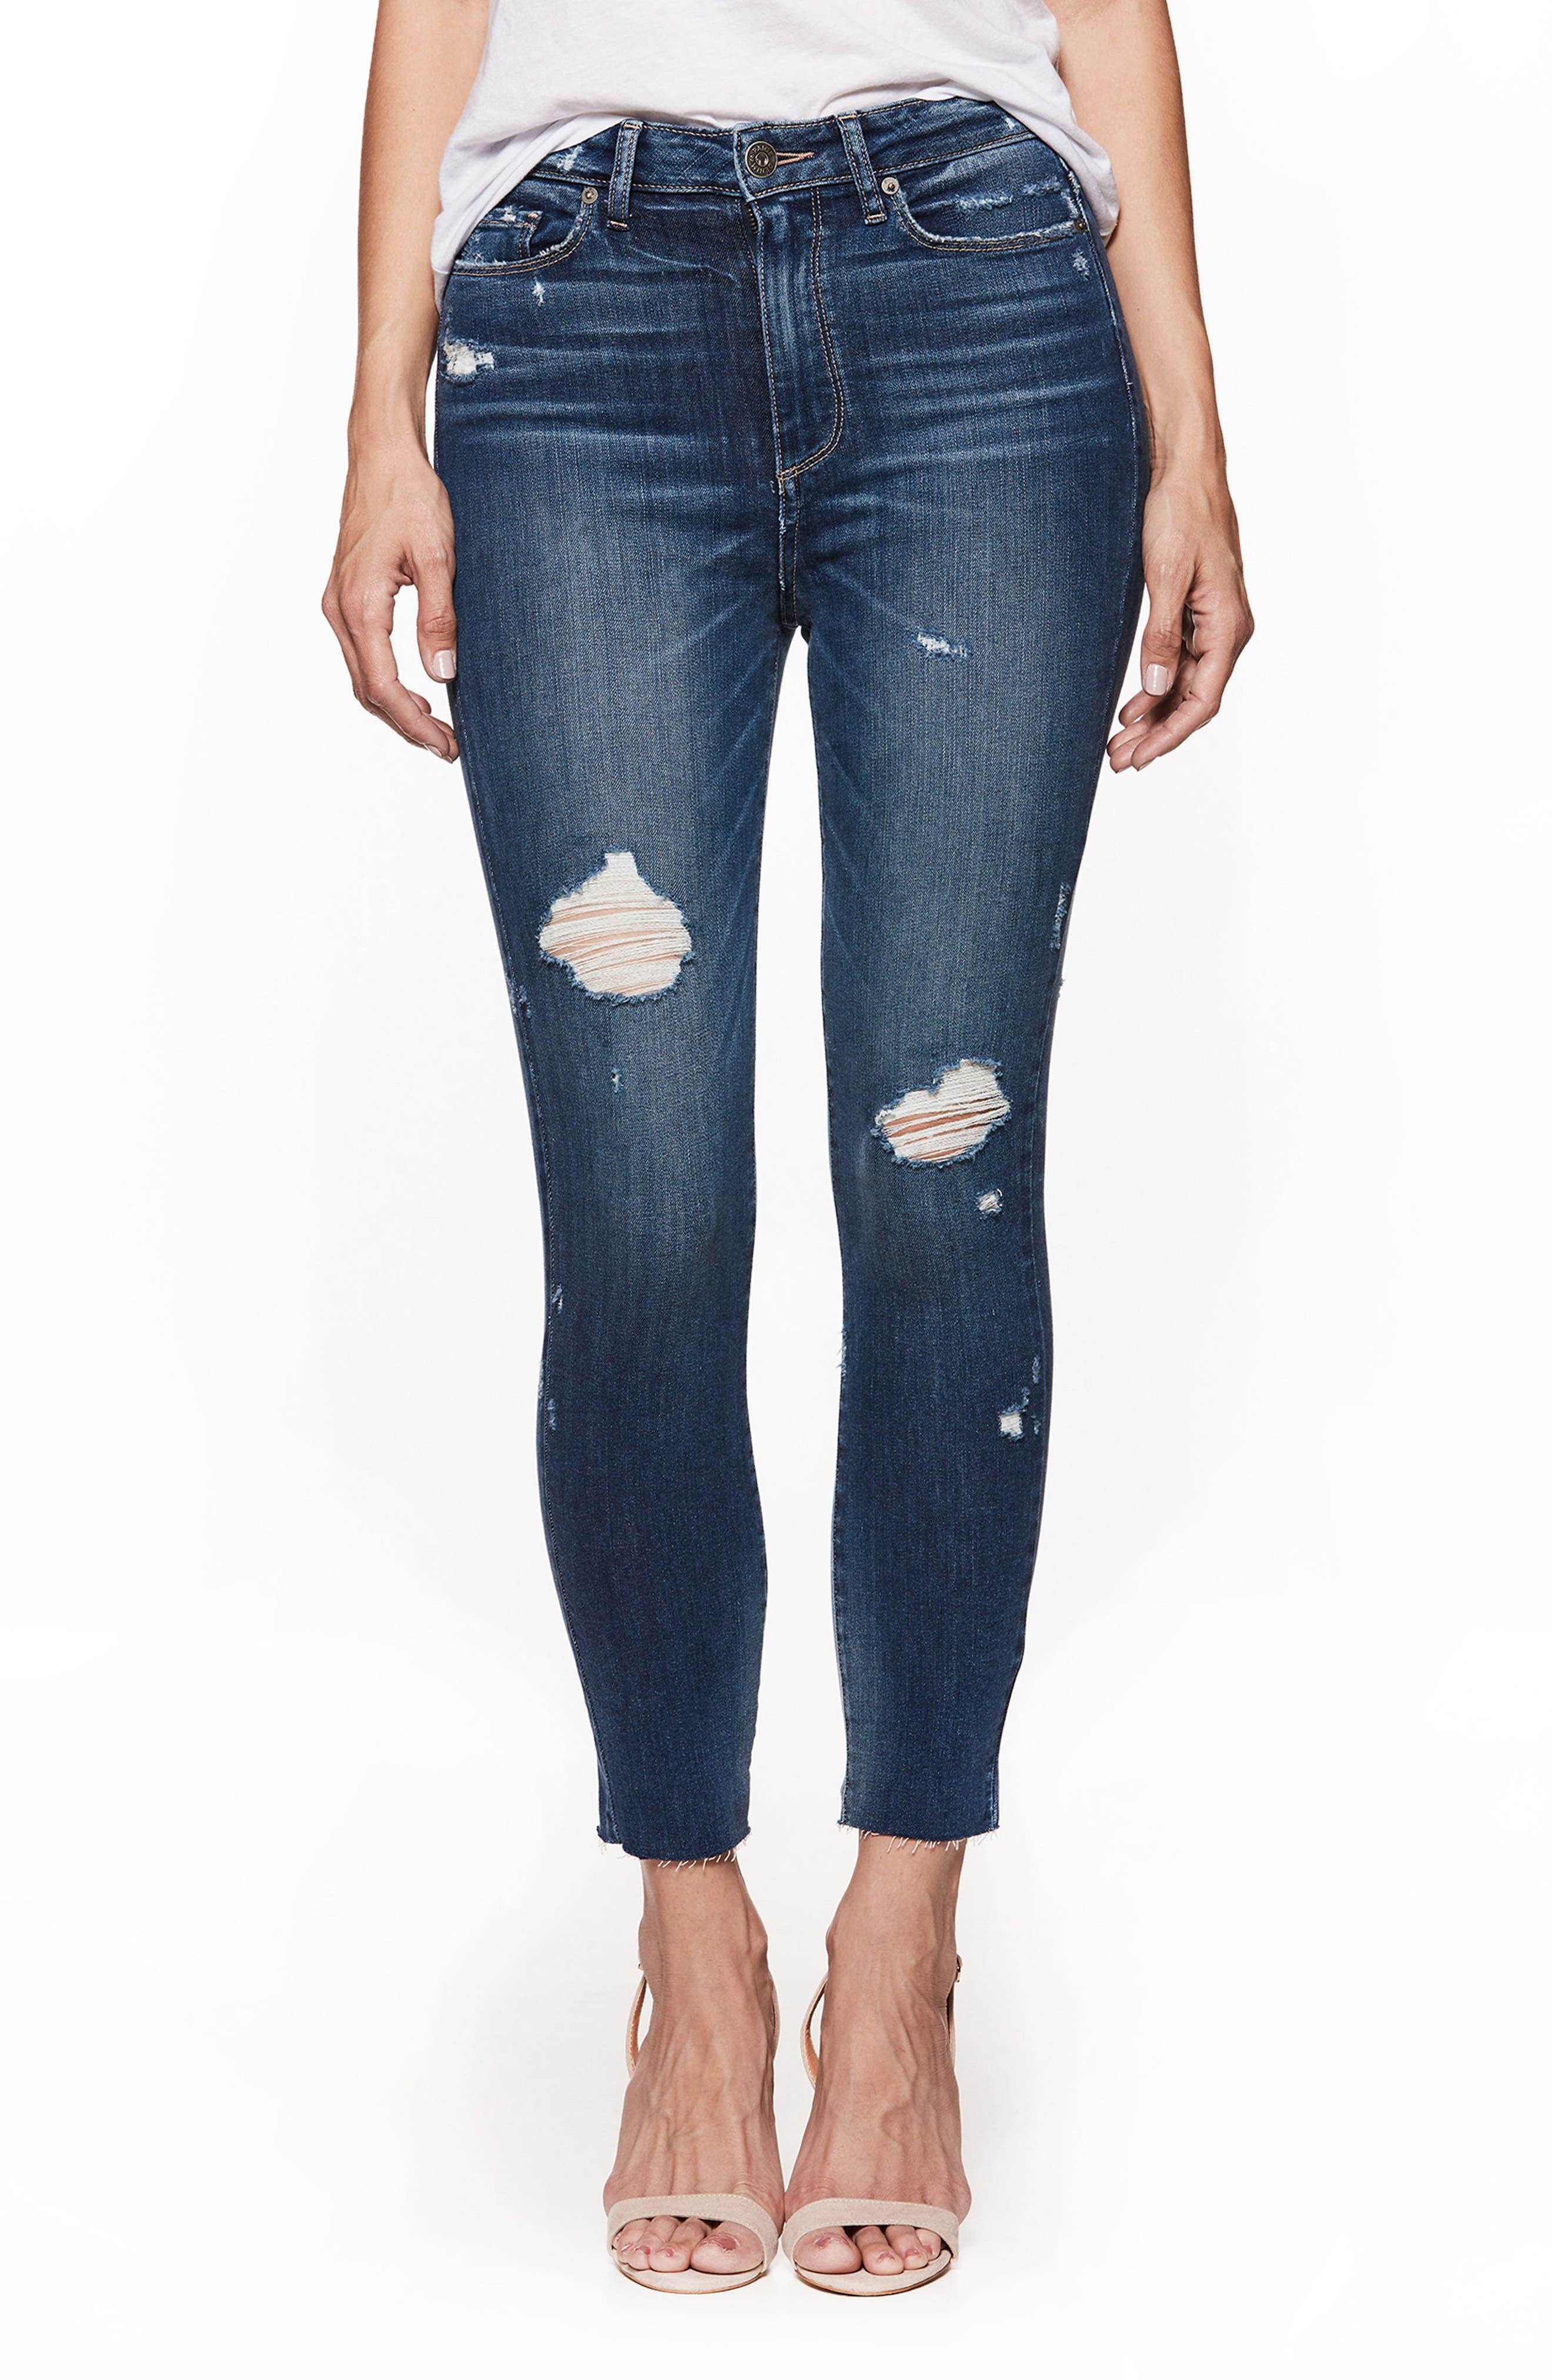 Transcend Vintage - Margot High Waist Crop Skinny Jeans,                             Main thumbnail 1, color,                             Cliffs Edge Destructed